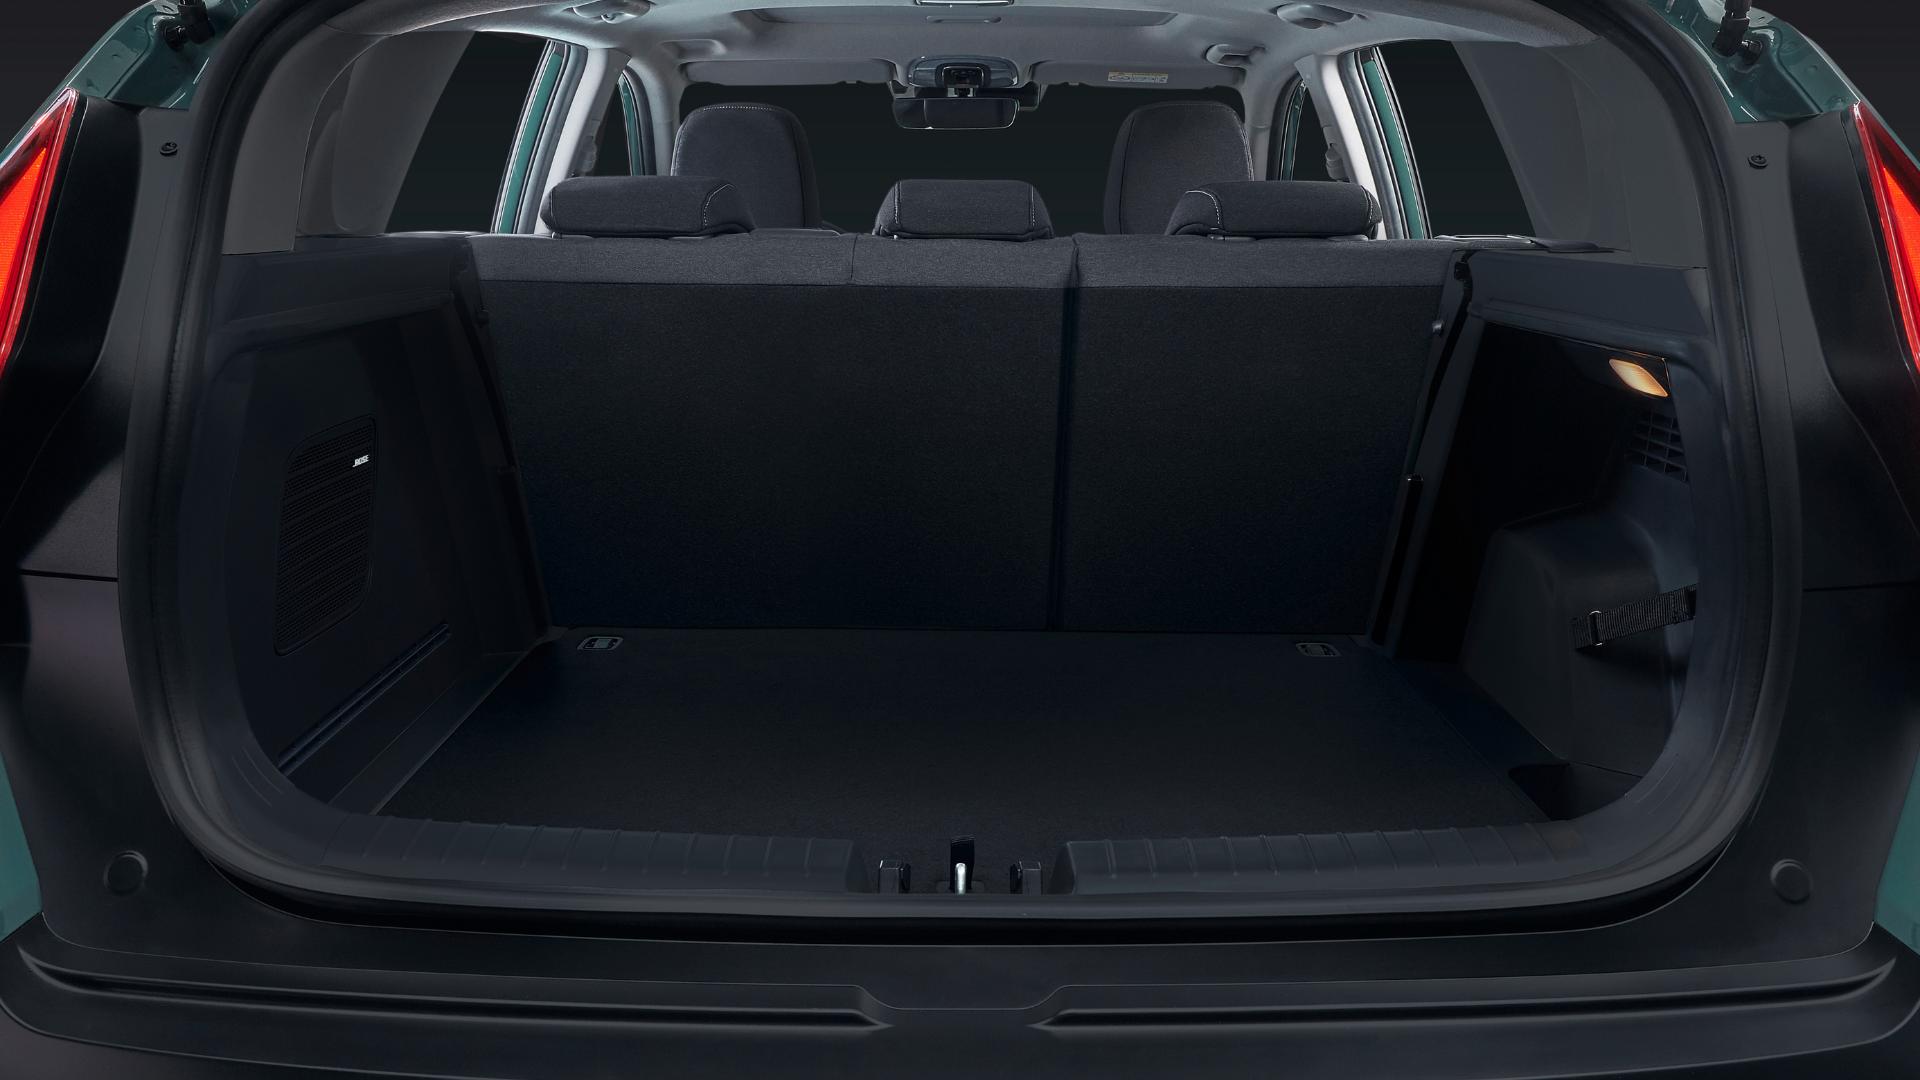 Hyundai-Bayon-bagagliaio